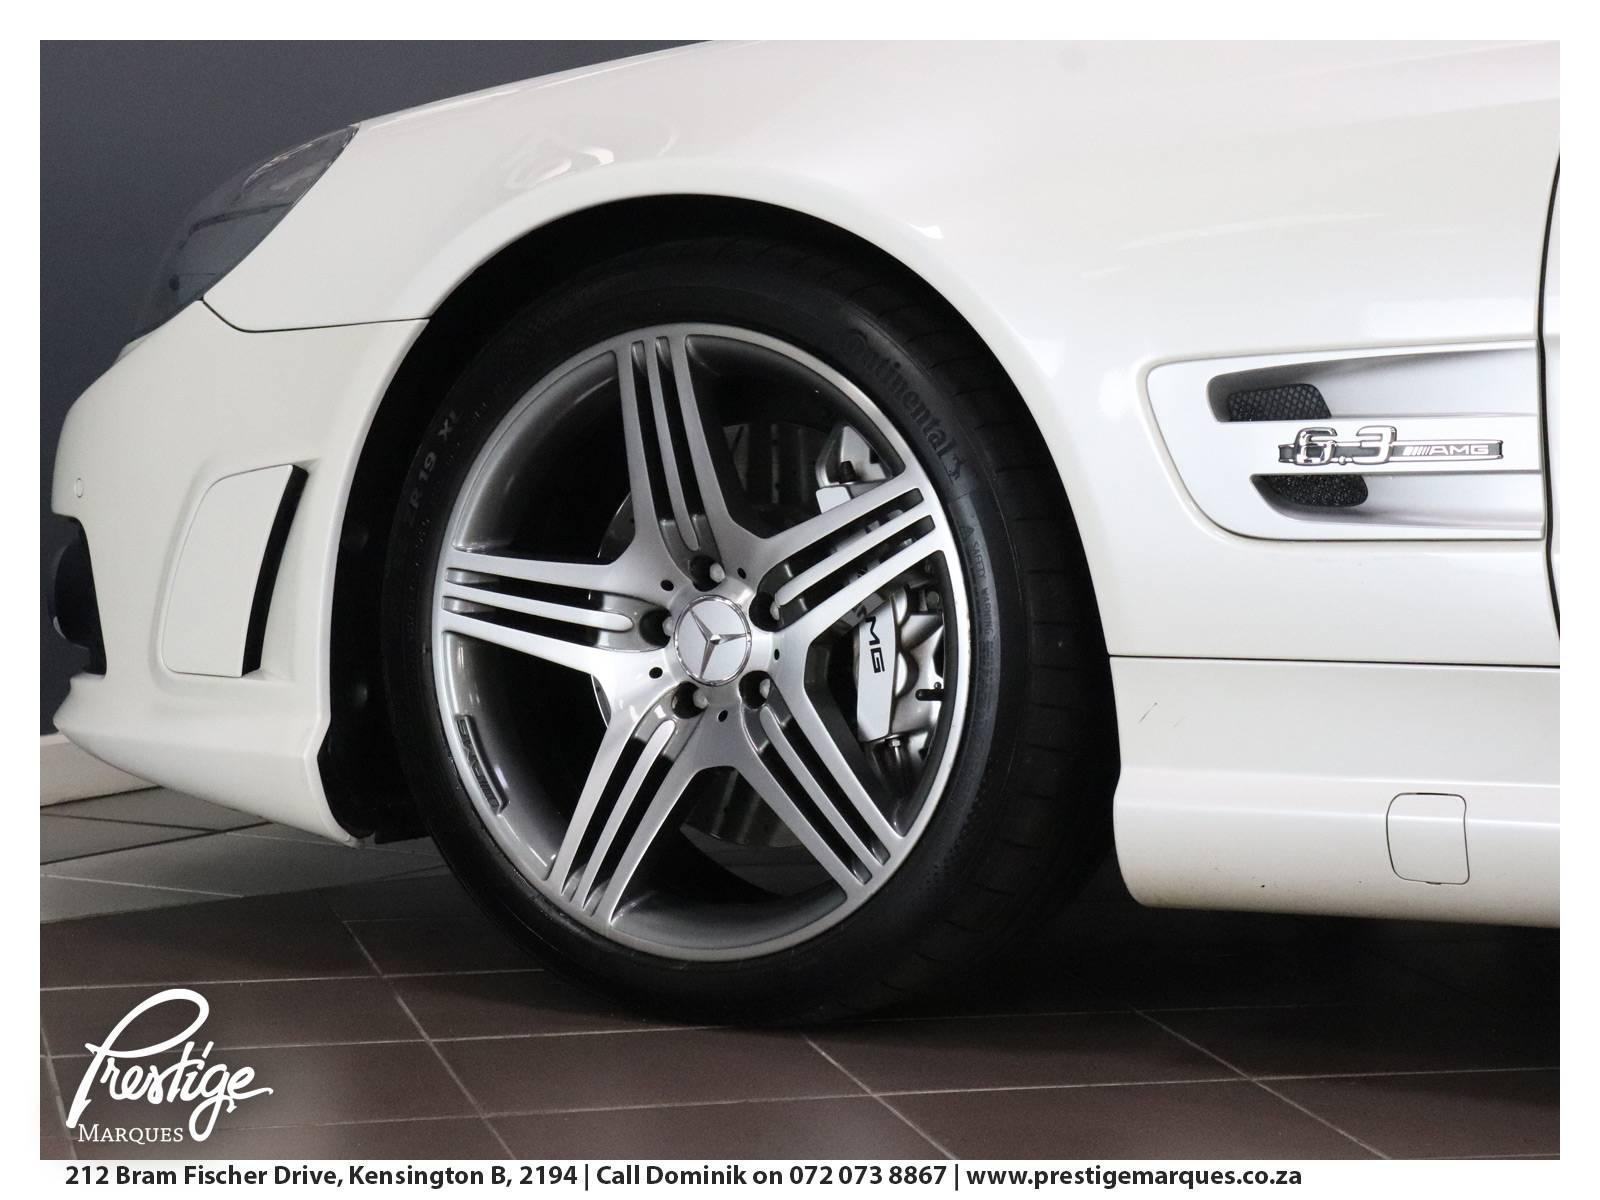 Mercedes-benz-sl-63-amg-prestige-marques-randburg-sandton-18